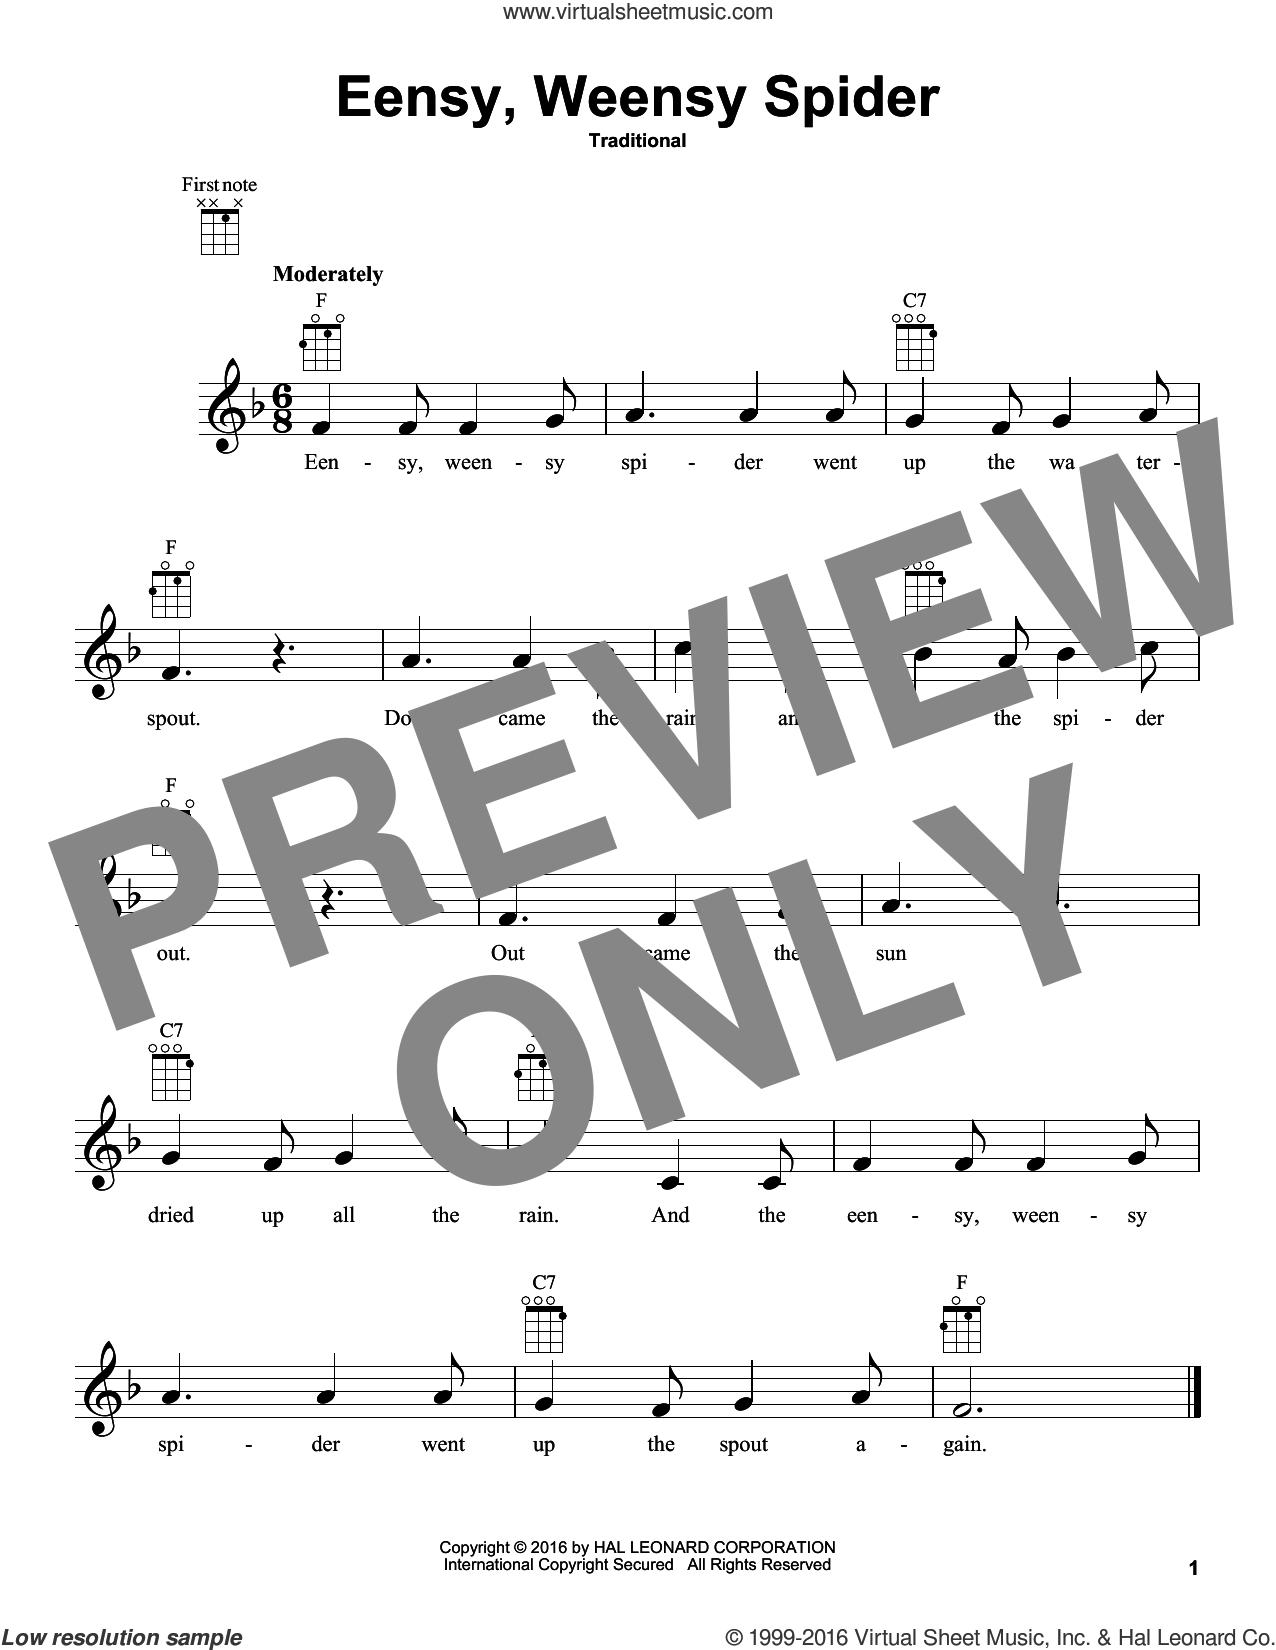 Eensy Weensy Spider sheet music for ukulele, intermediate skill level